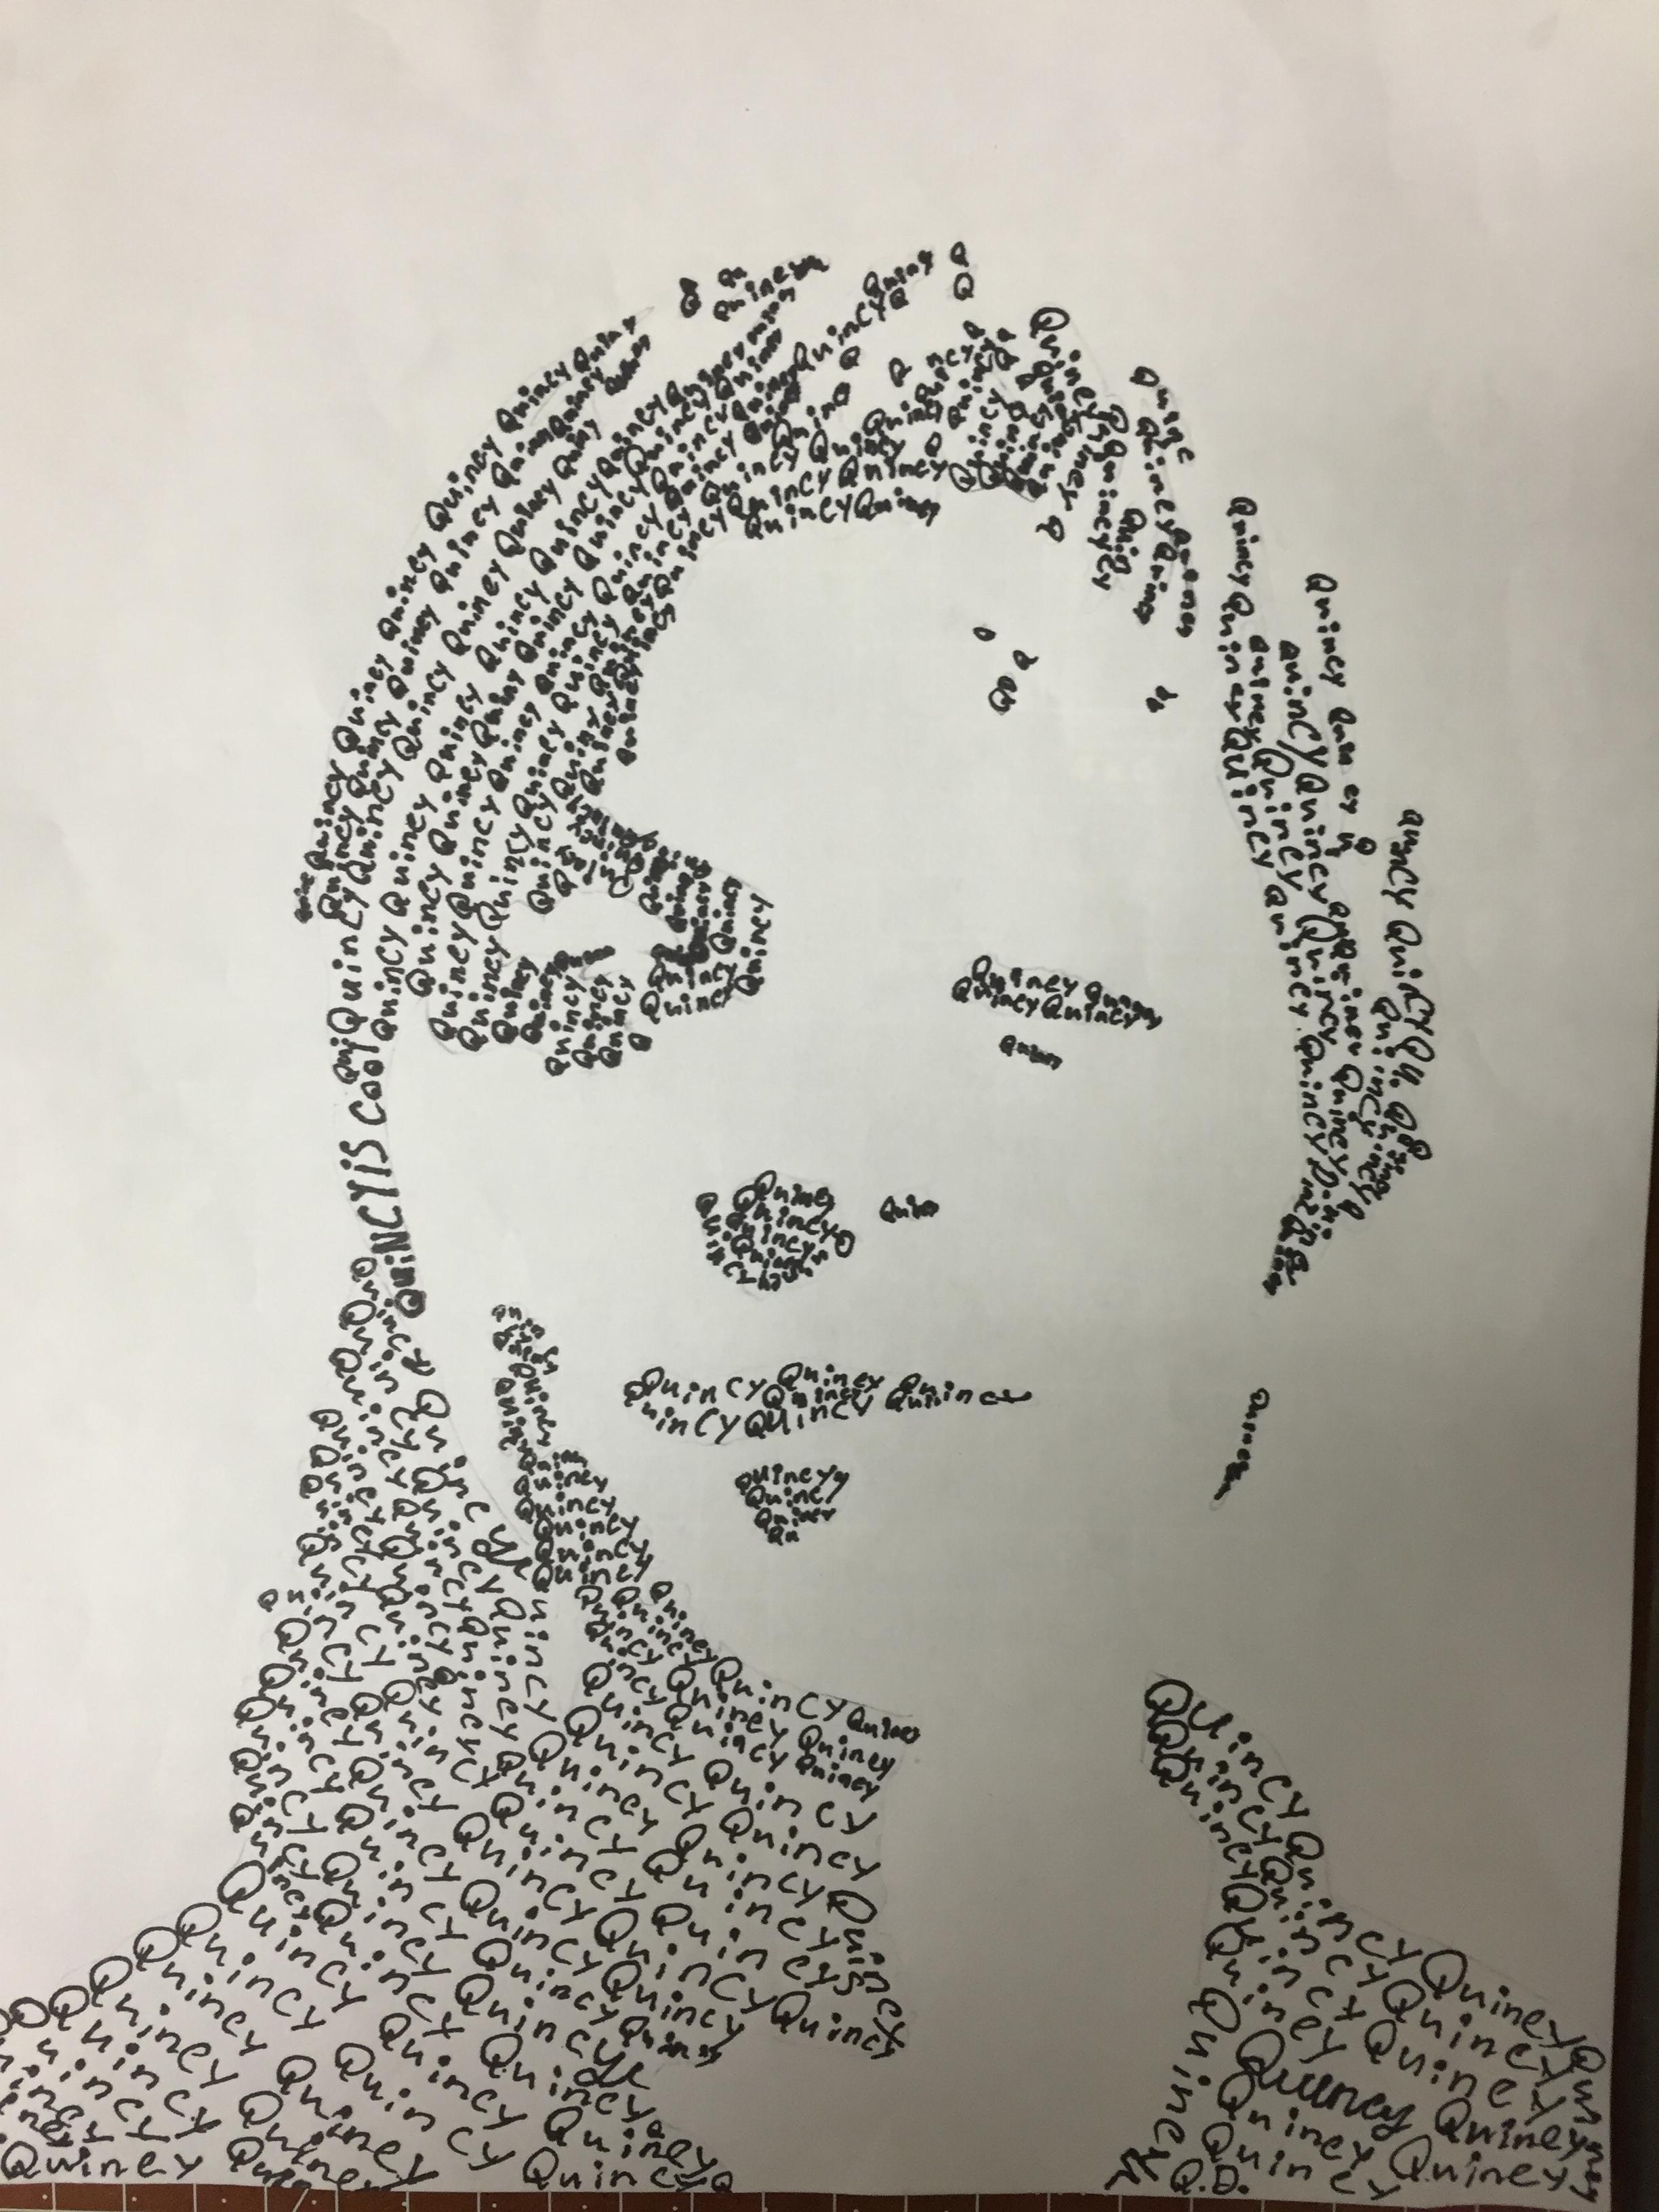 Quincy Diaz, 7th Grade